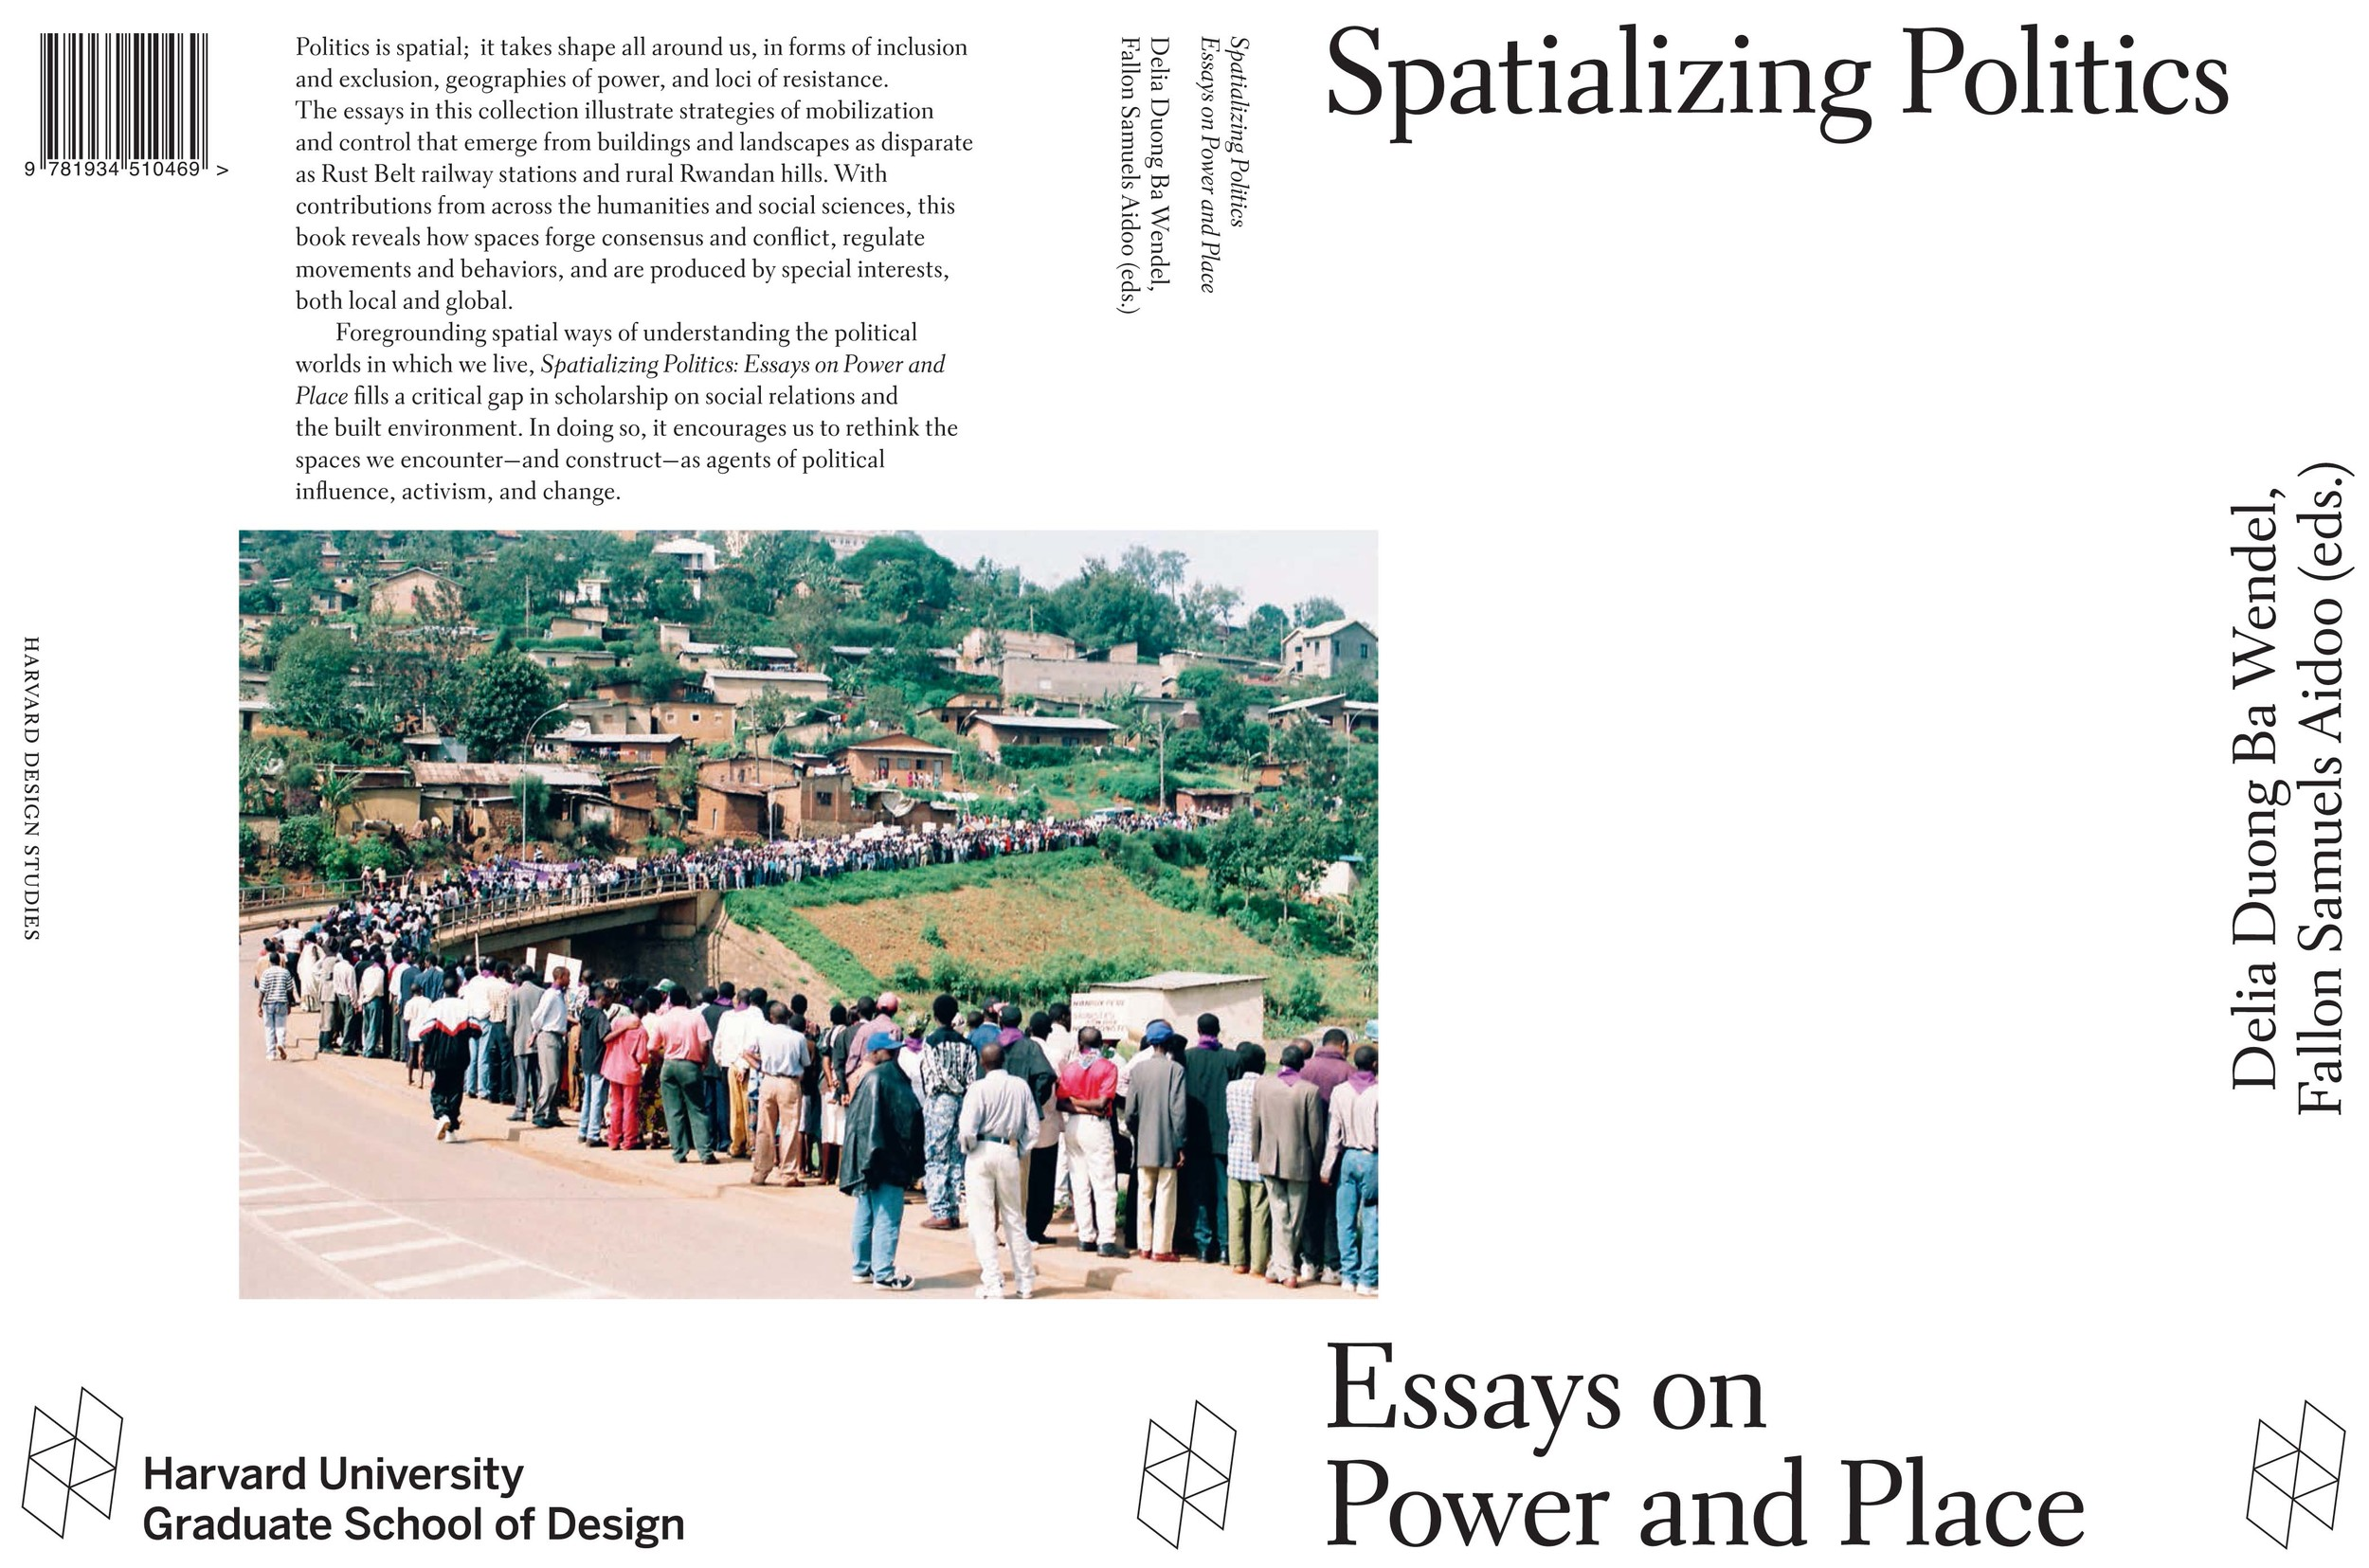 spatializing politics delia duong ba wendel spatializing politics